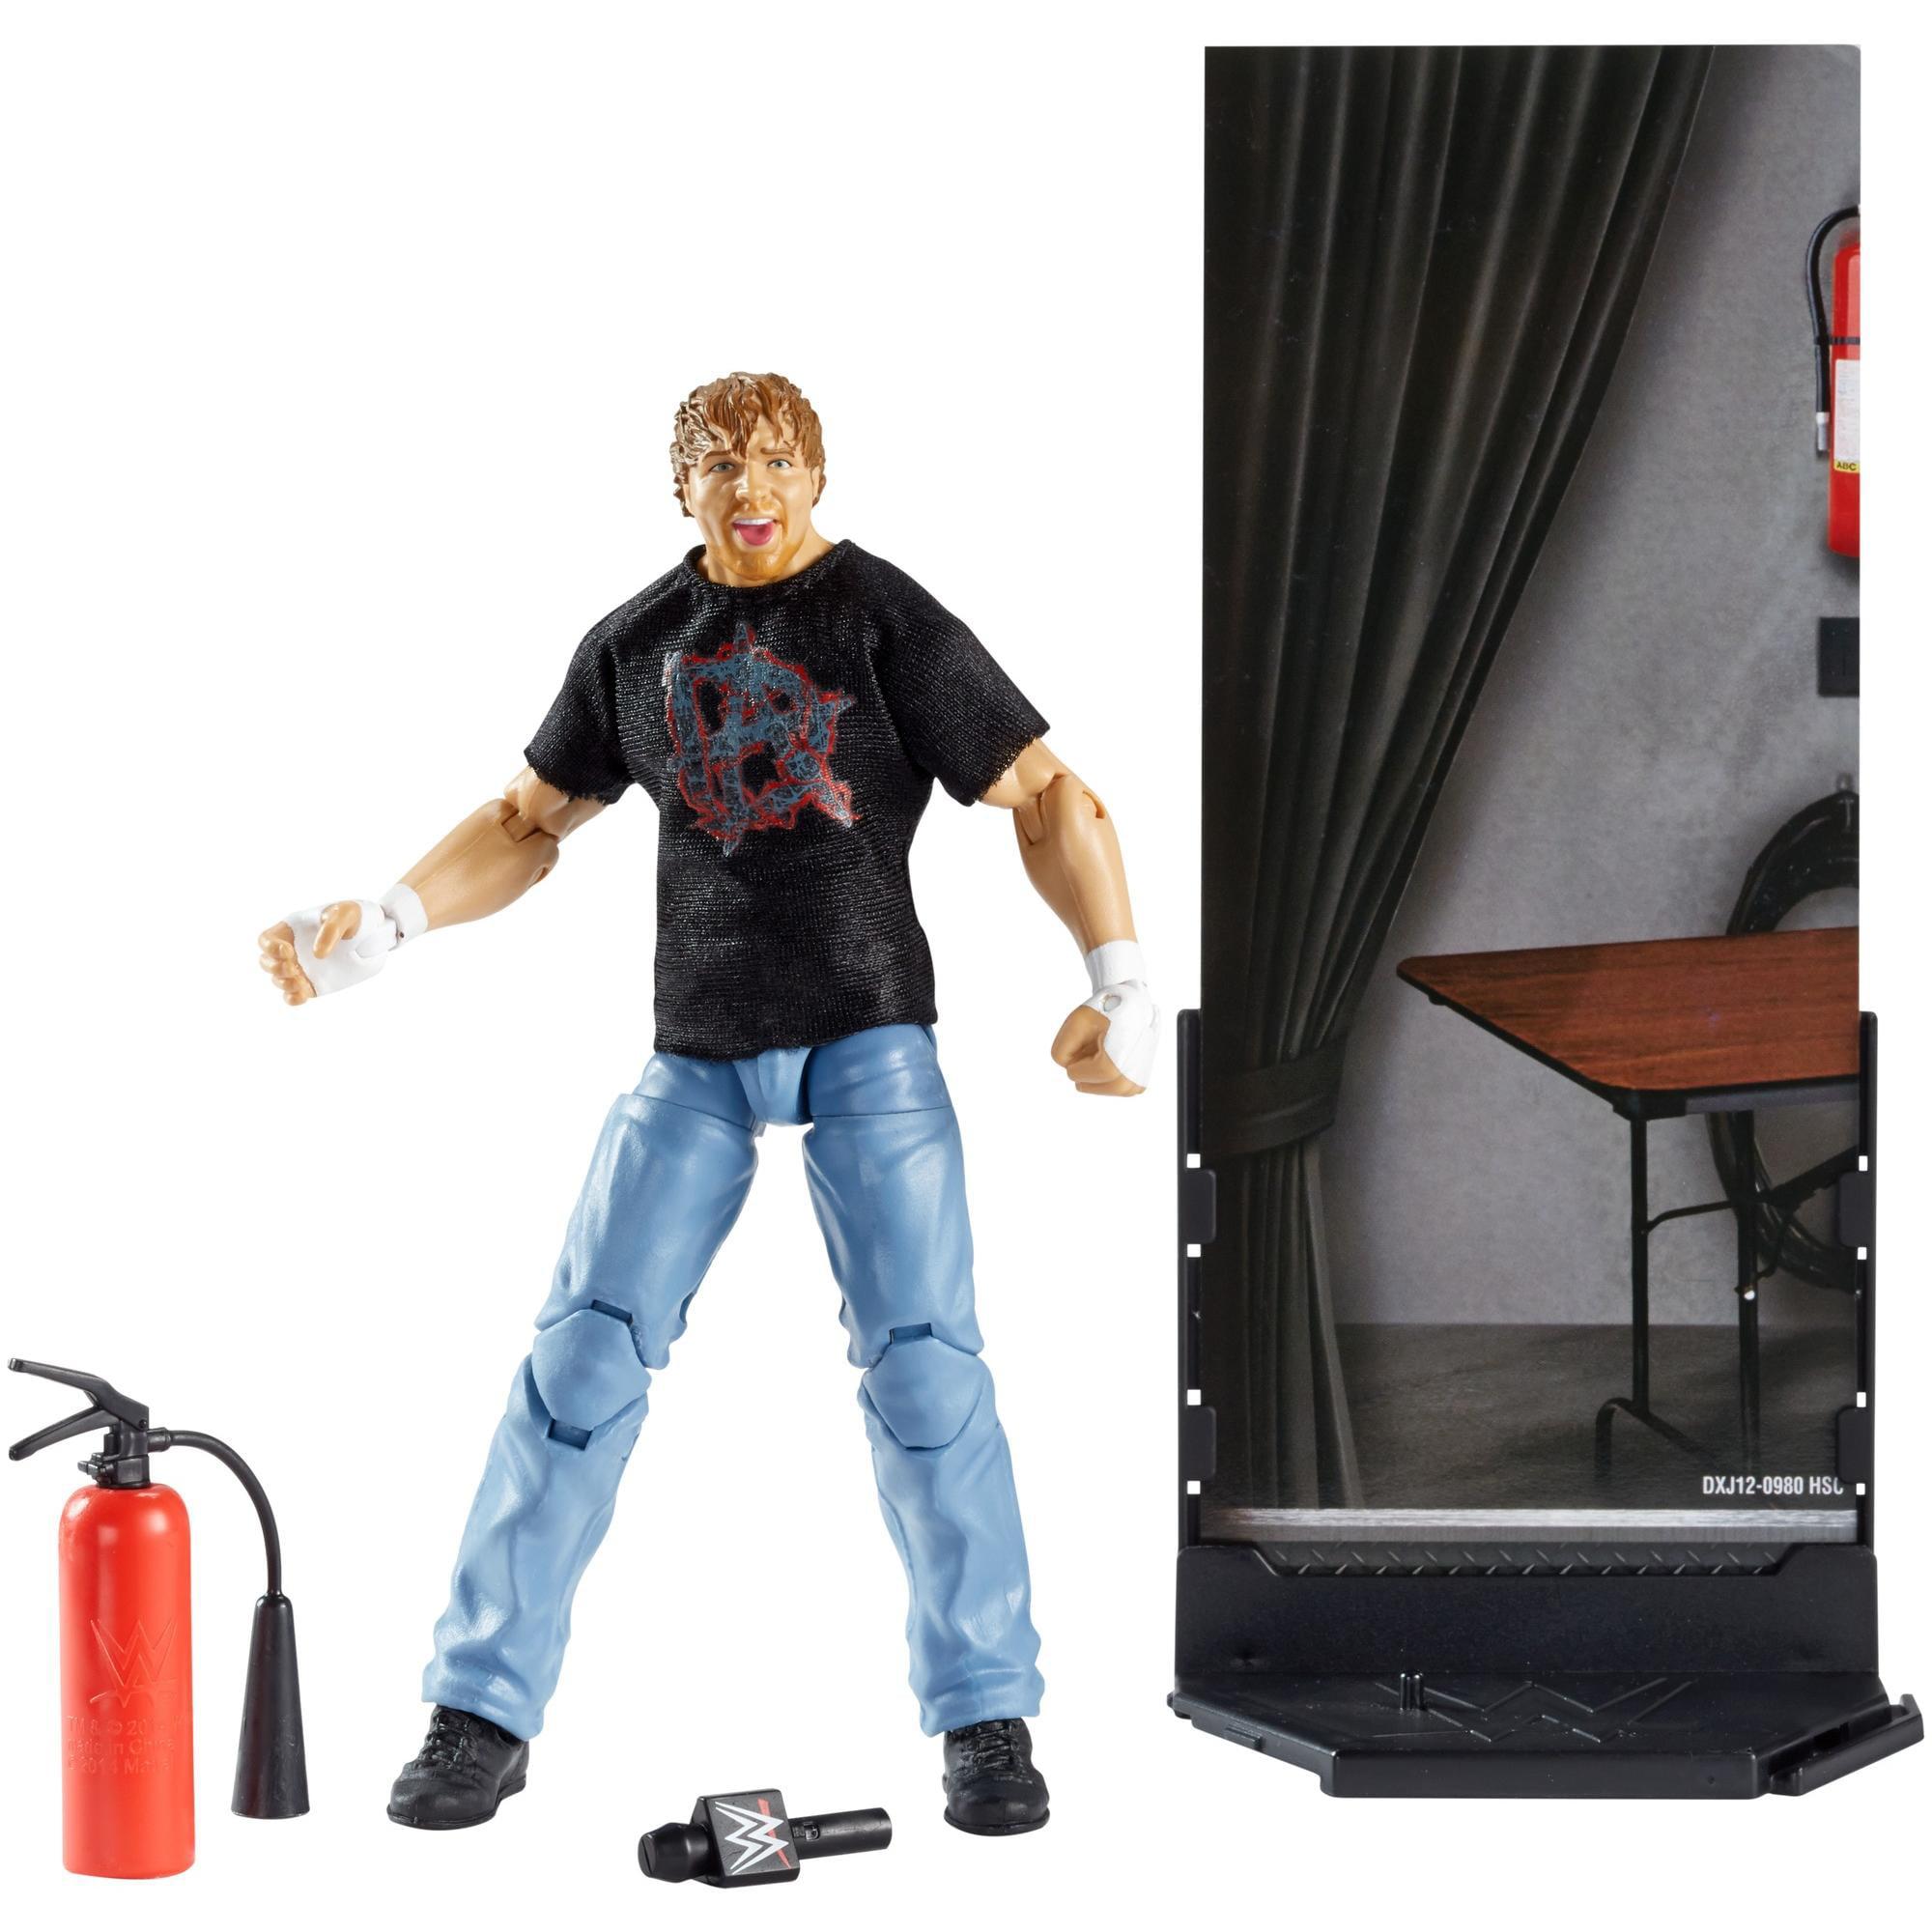 WWE Elite Collection Dean Ambrose Action Figure by Mattel